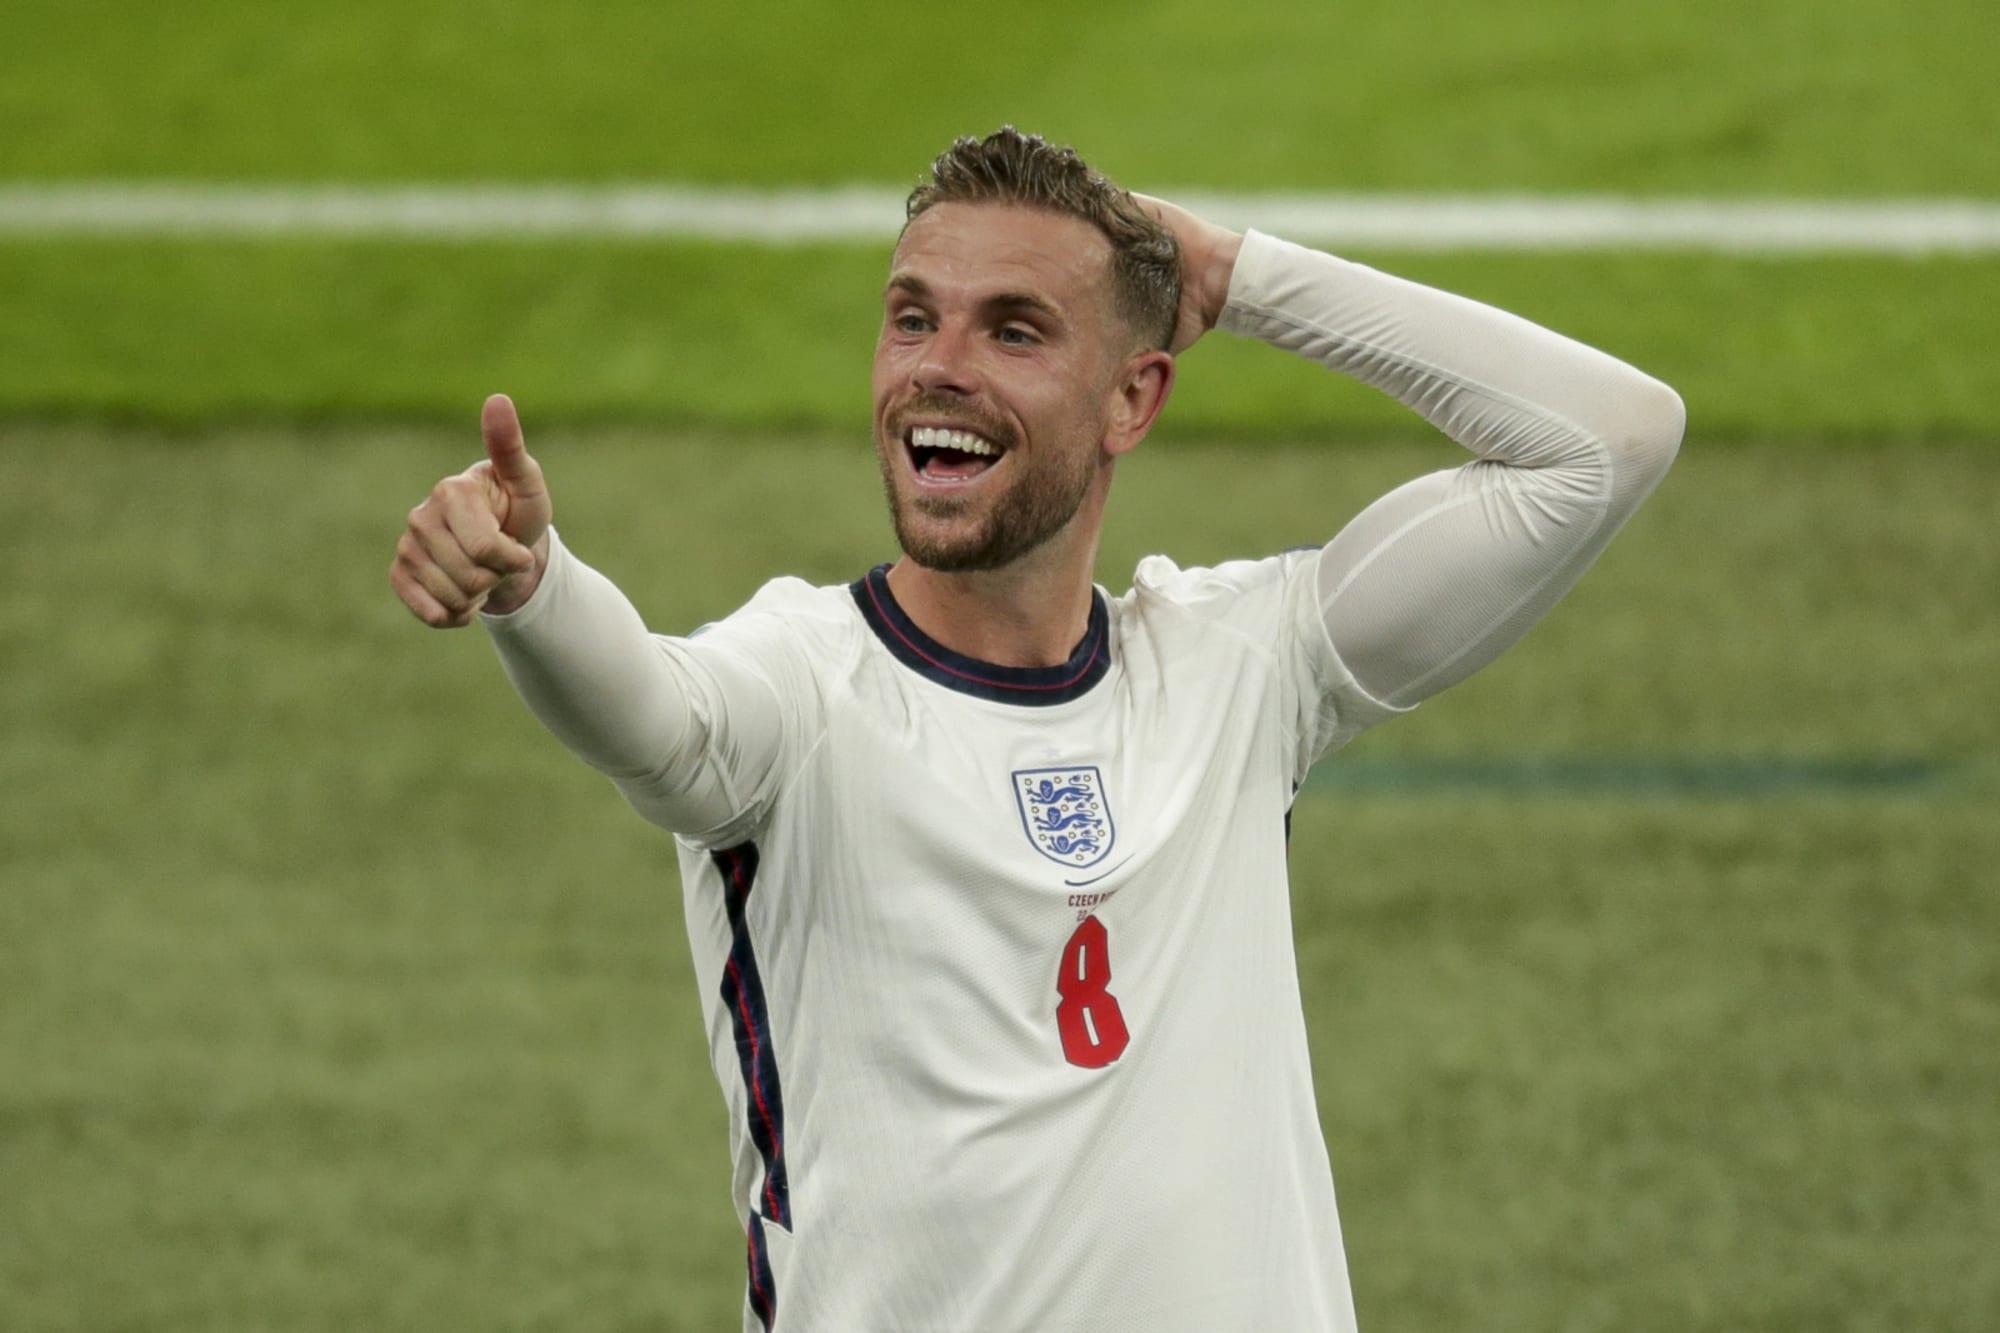 Henderson, Ramsey and Tottenham Hotspur in latest transfer gossip?